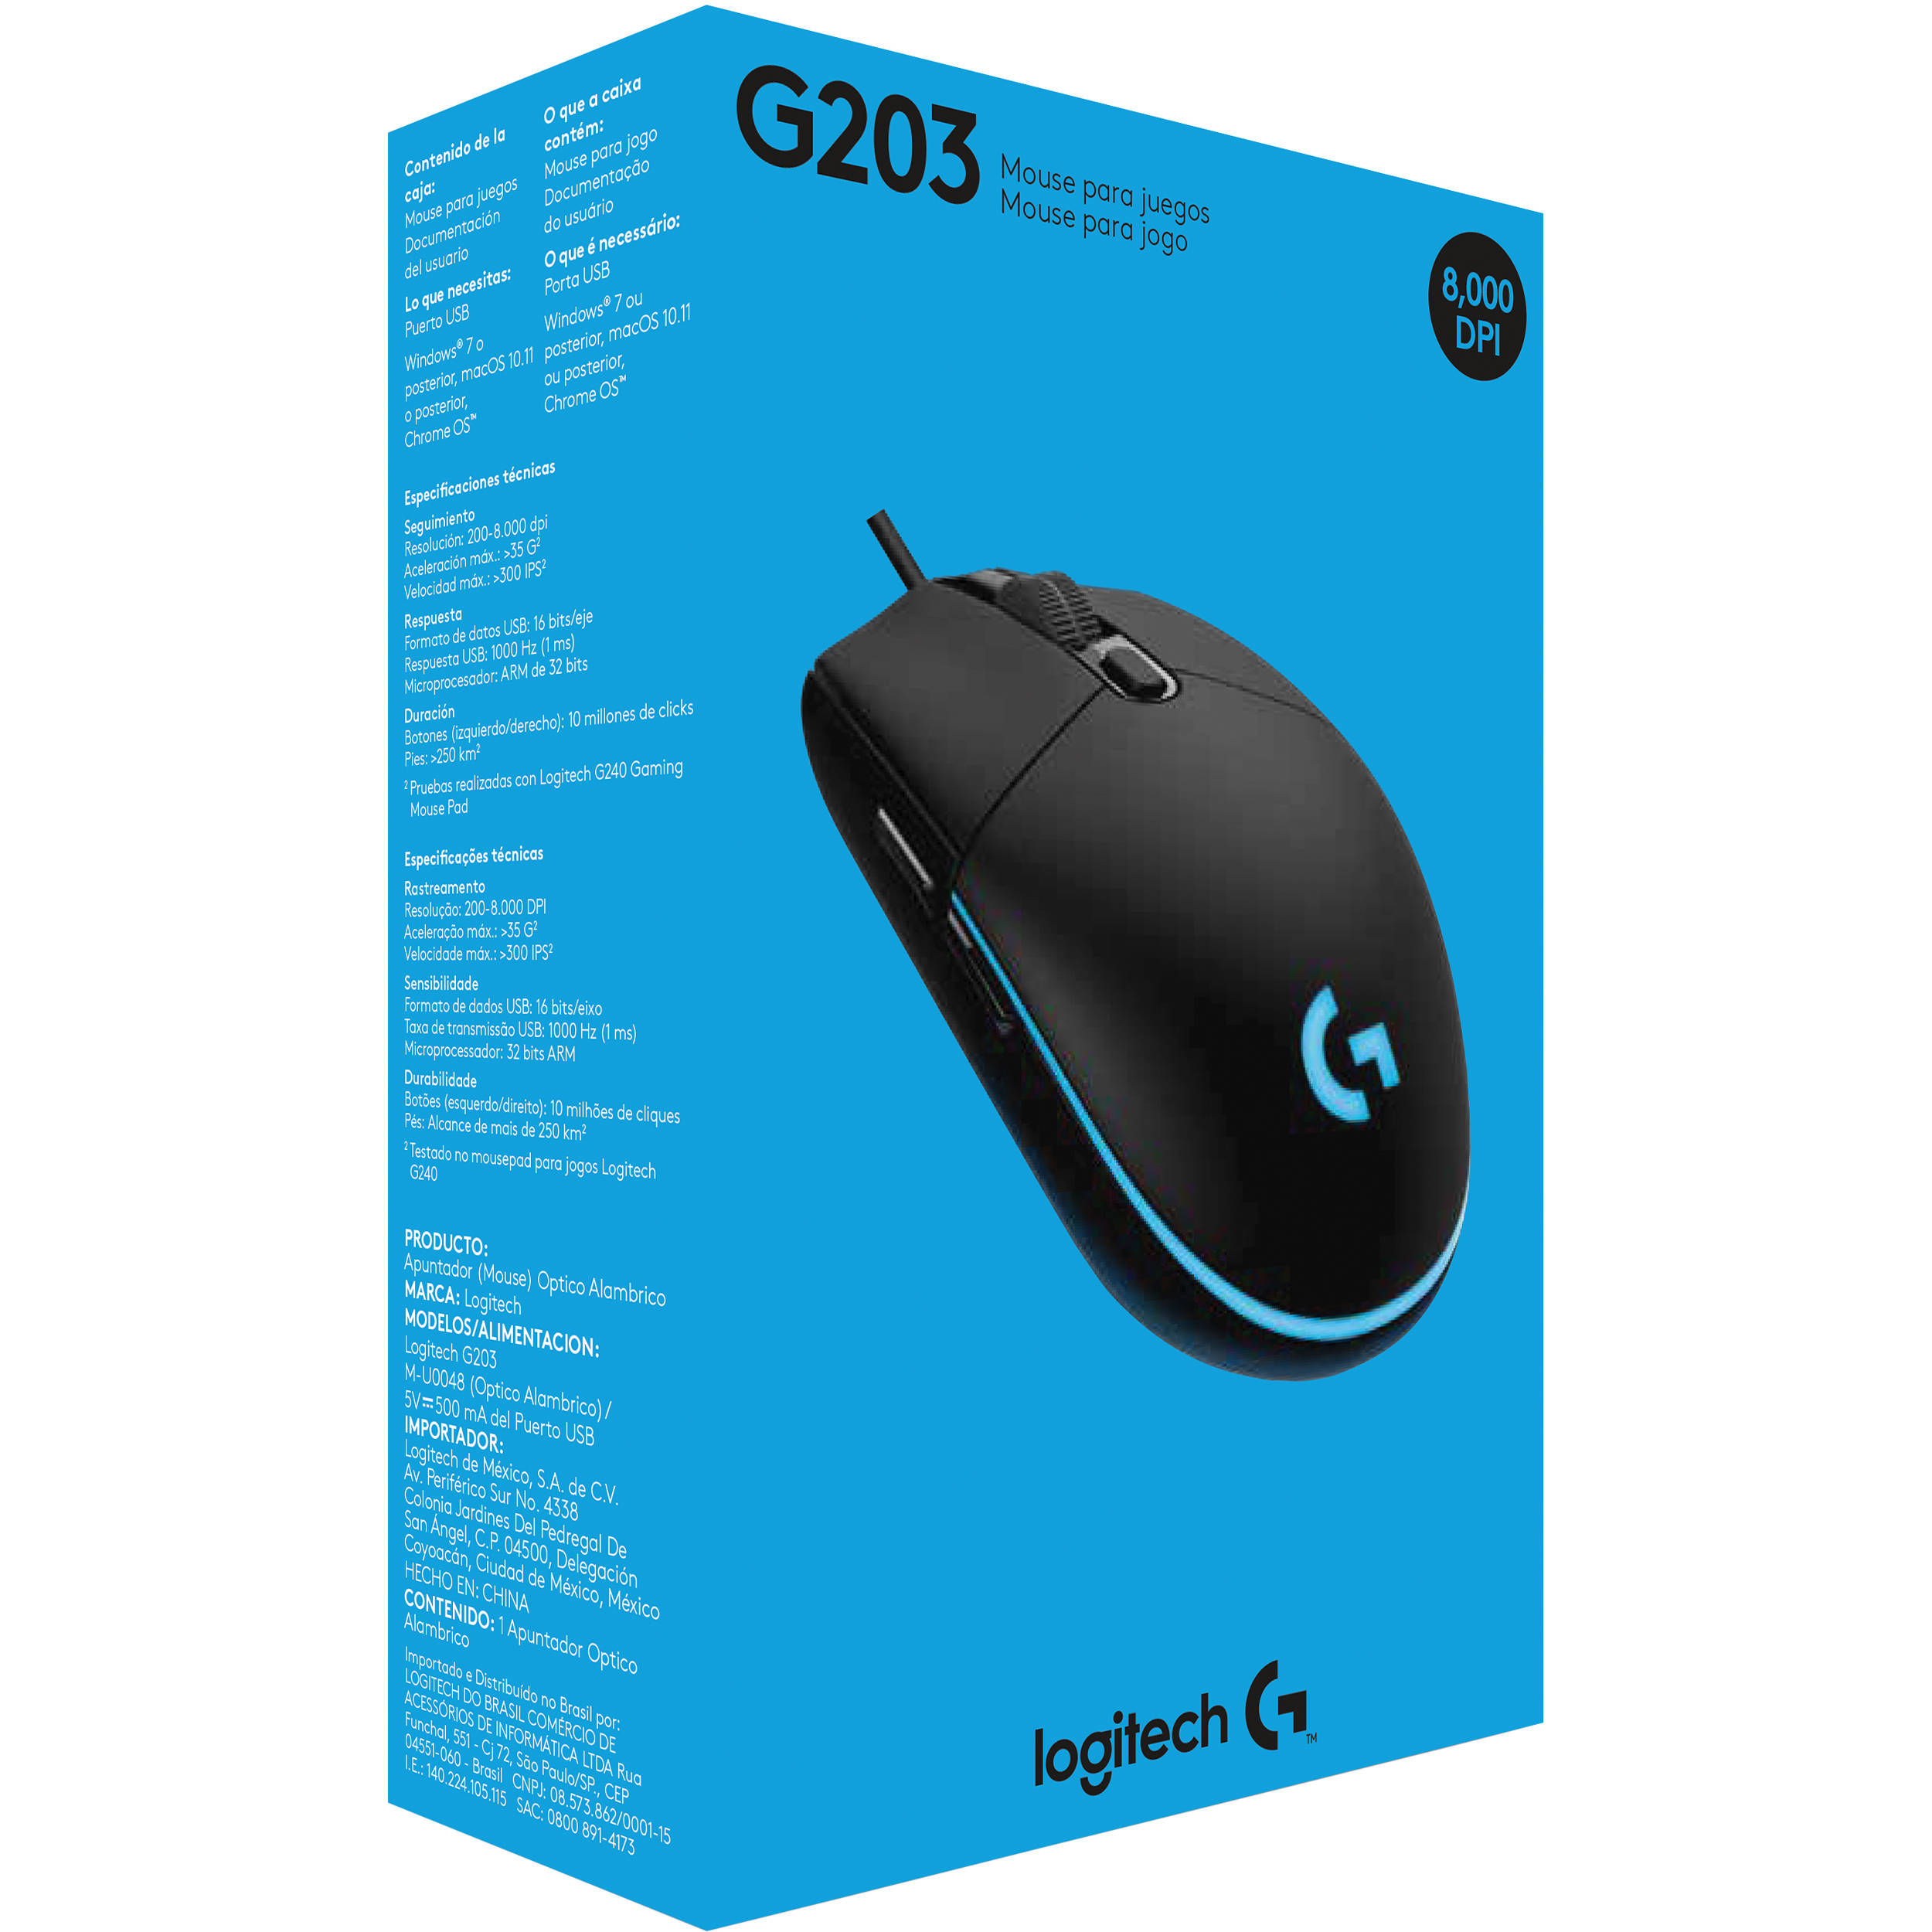 Logitech G203 Prodigy Wired Mouse (Black)